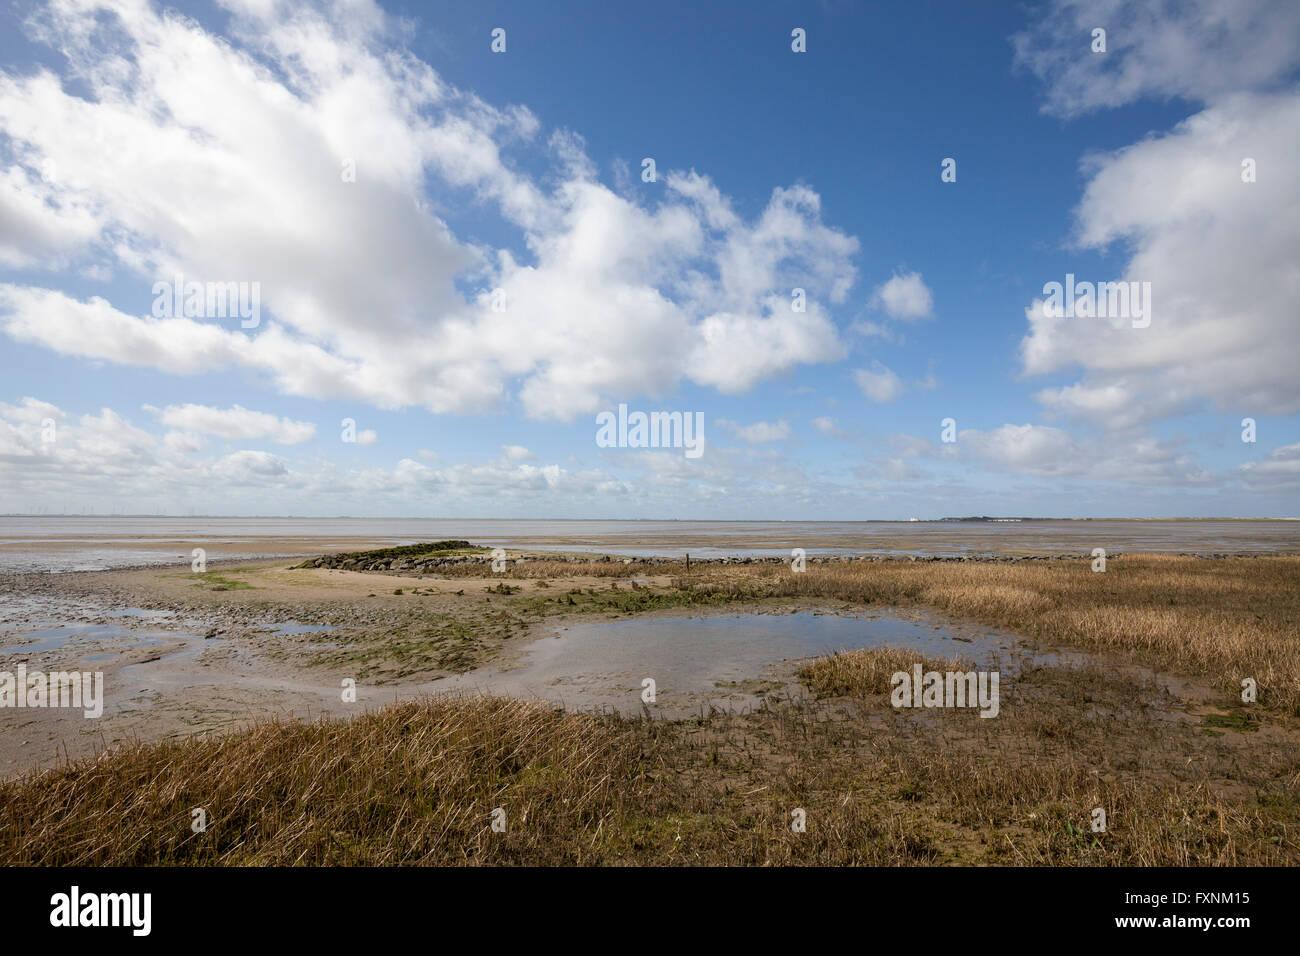 Beach, Lower Saxon Wadden Sea National Park, Wangerooge, East Frisian Island, East Frisia, Lower Saxony, Germany Stock Photo